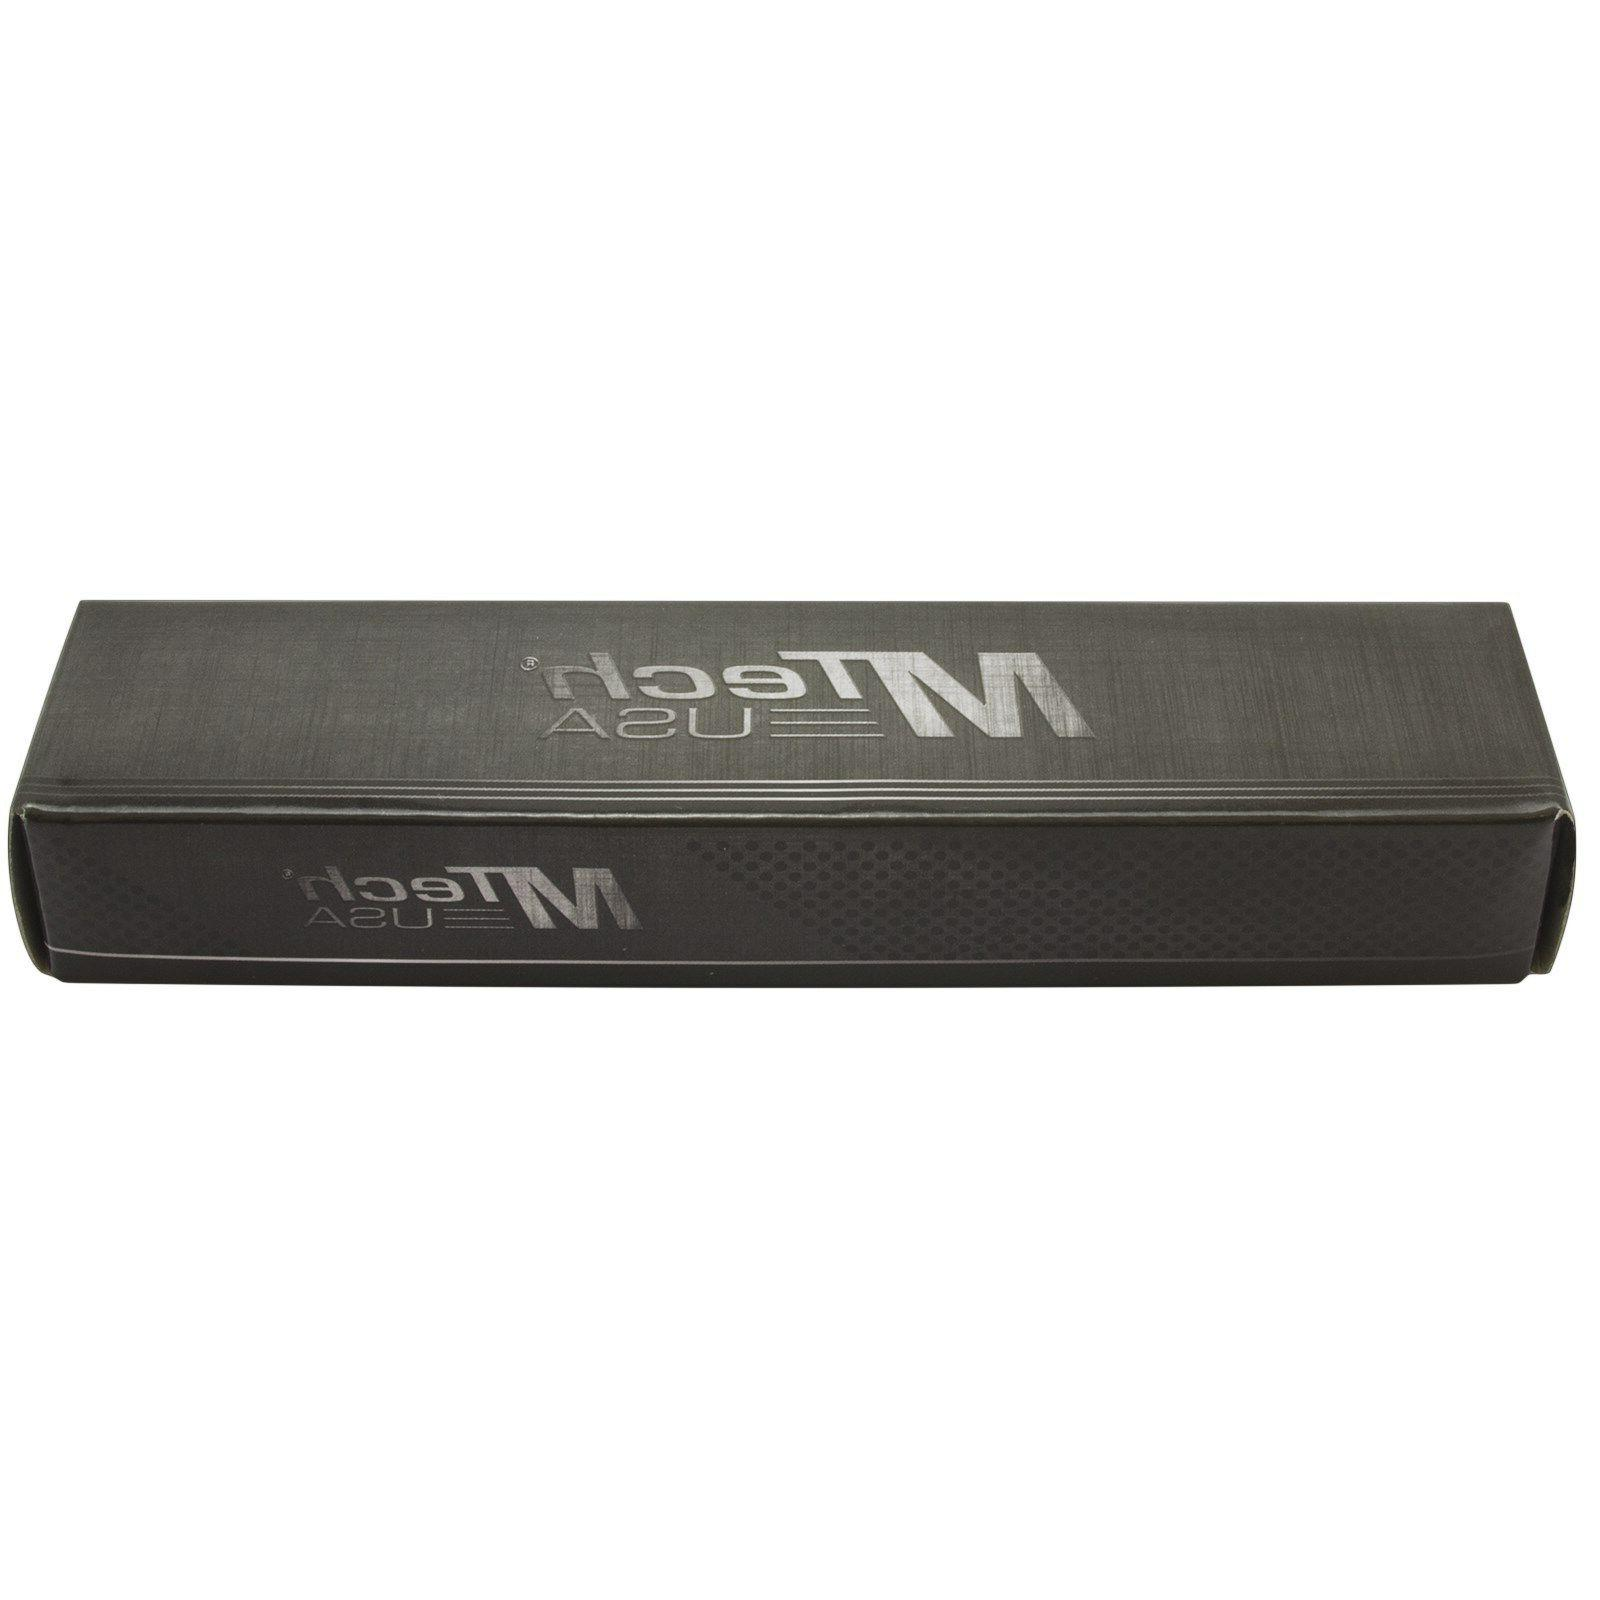 "6"" MTECH USA MINI Pocket Blade"